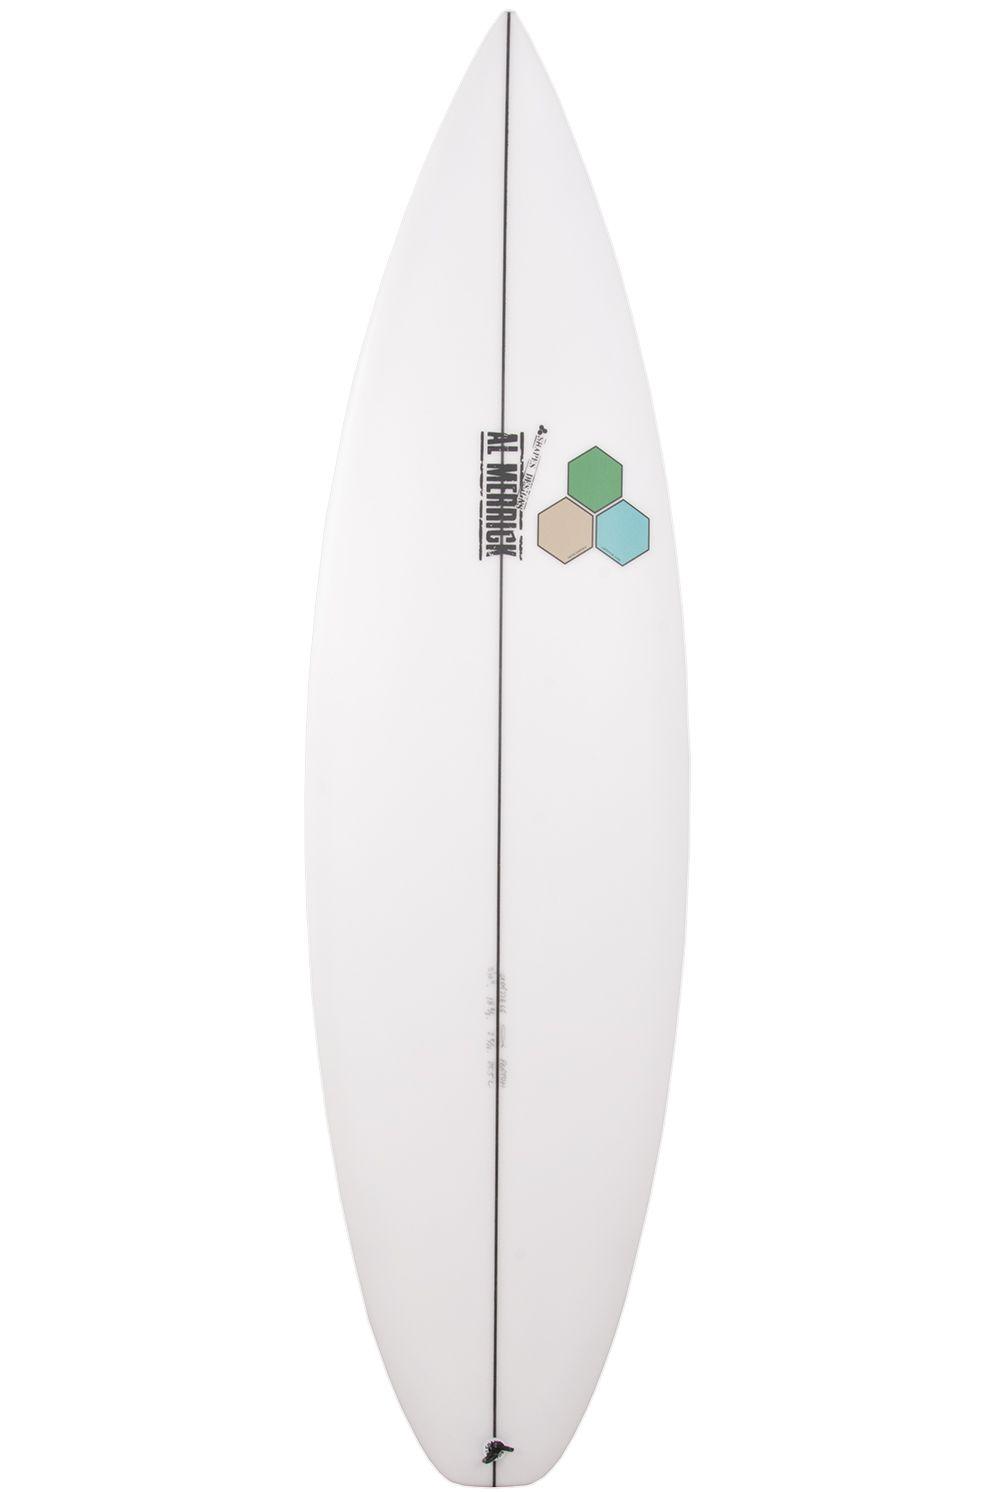 Prancha Surf Al Merrick PROTON Squash Tail - White